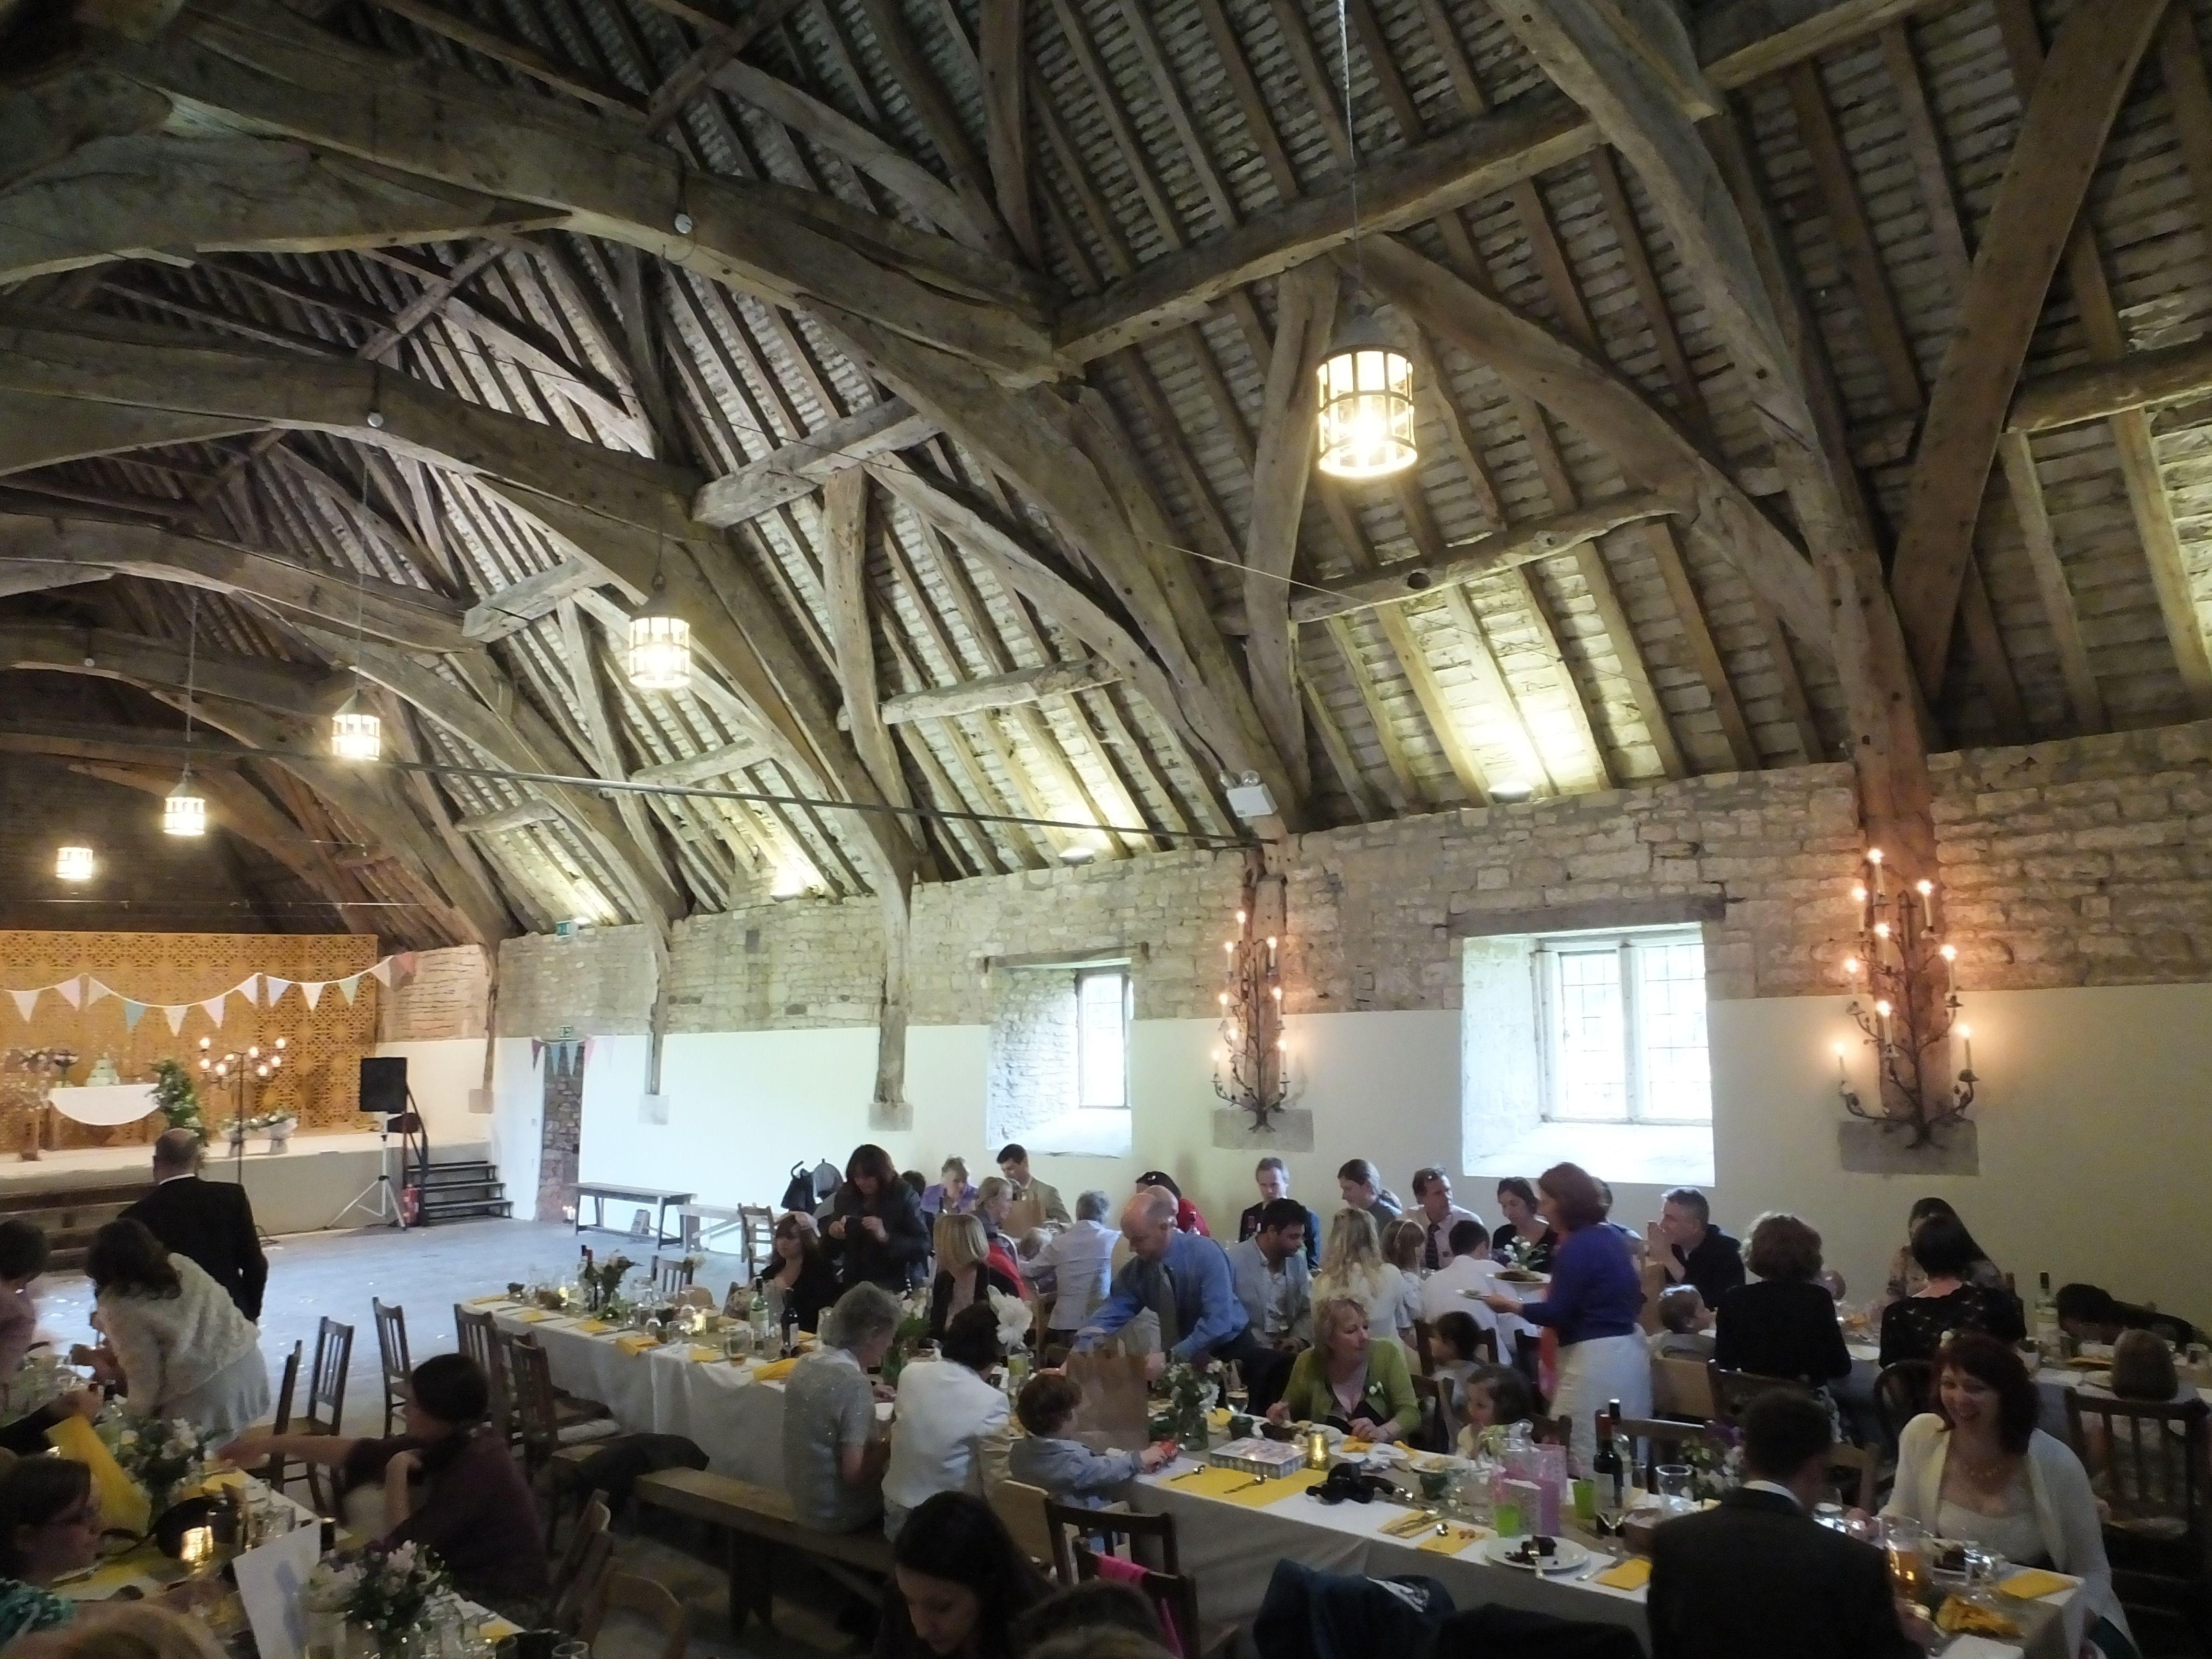 Wedding Interior At Stanway Tithe Barn Gloucestershire Uk